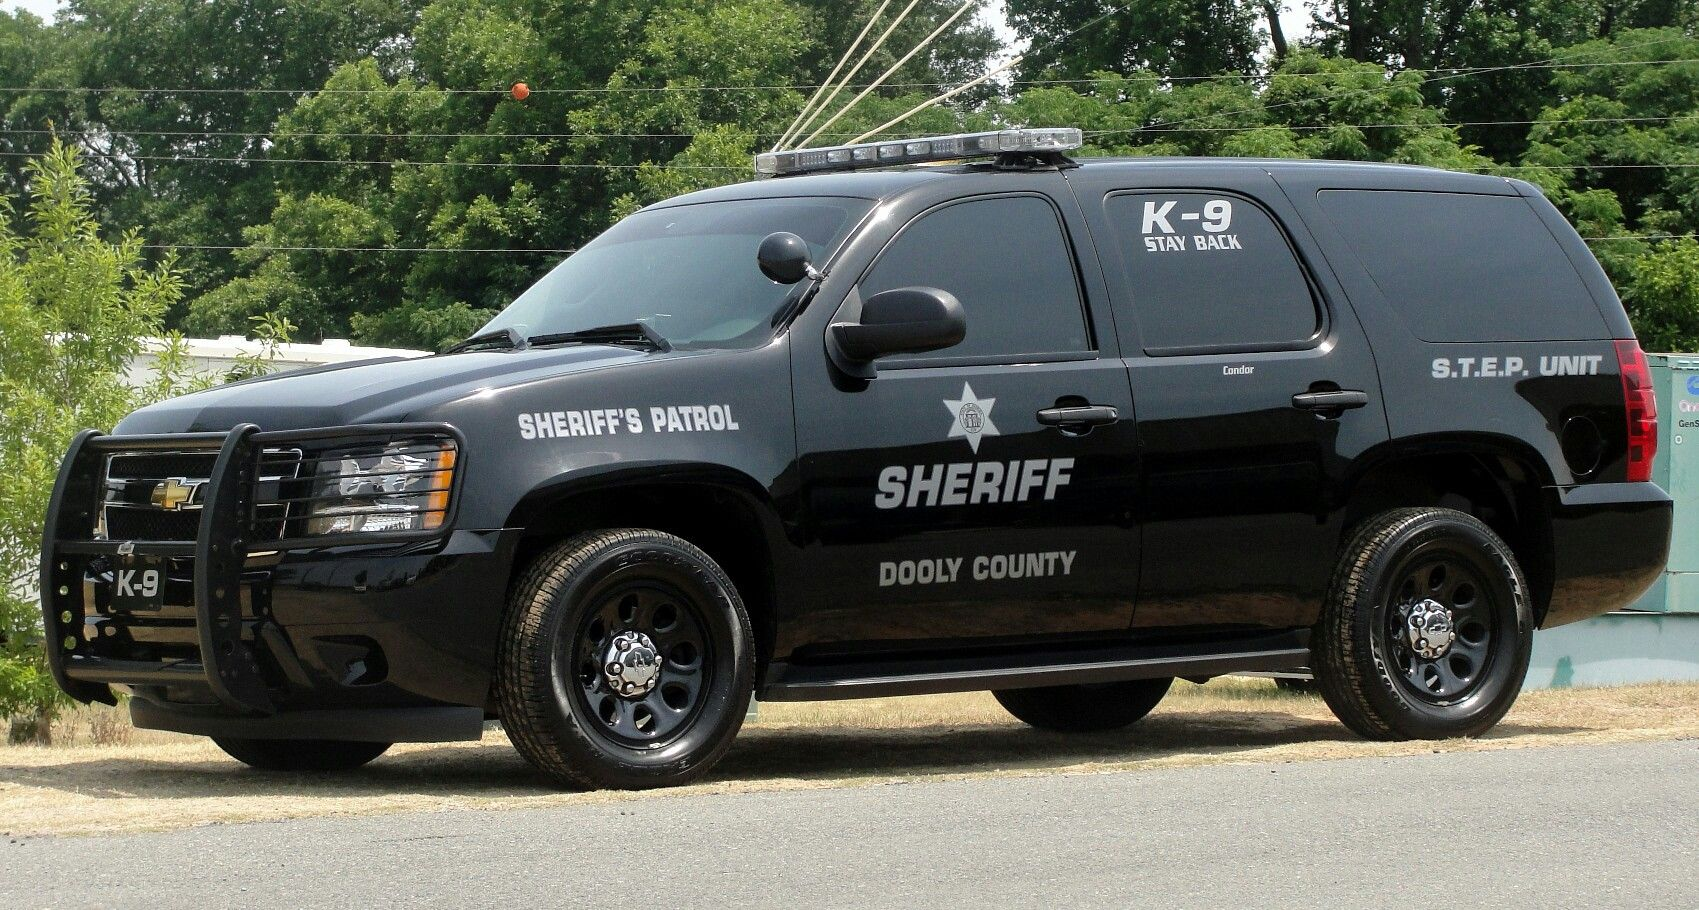 Dooly County (GA) Sheriff K-9 Sheriff's Patrol S T E P  Unit